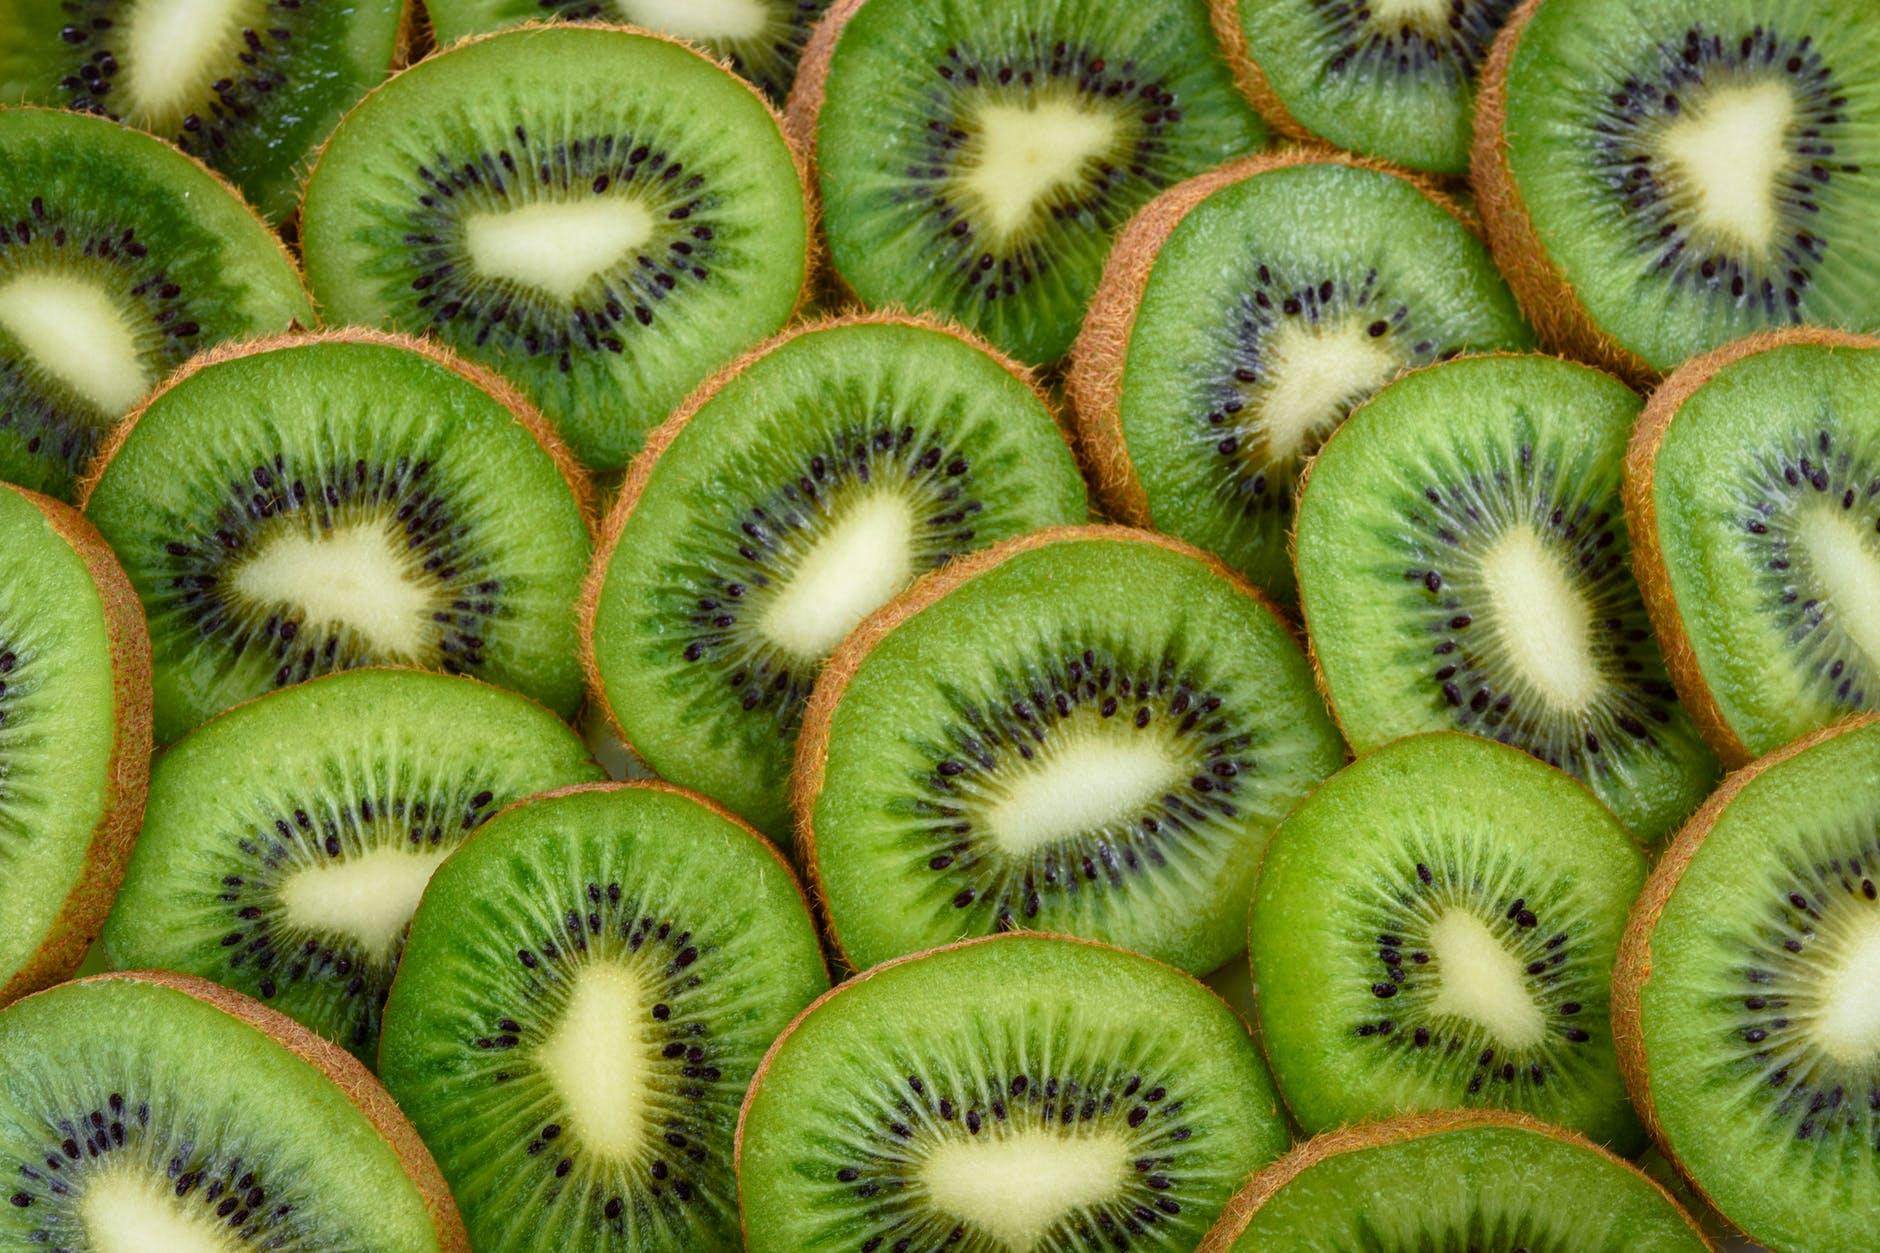 Kiwi as Immune Booster Food